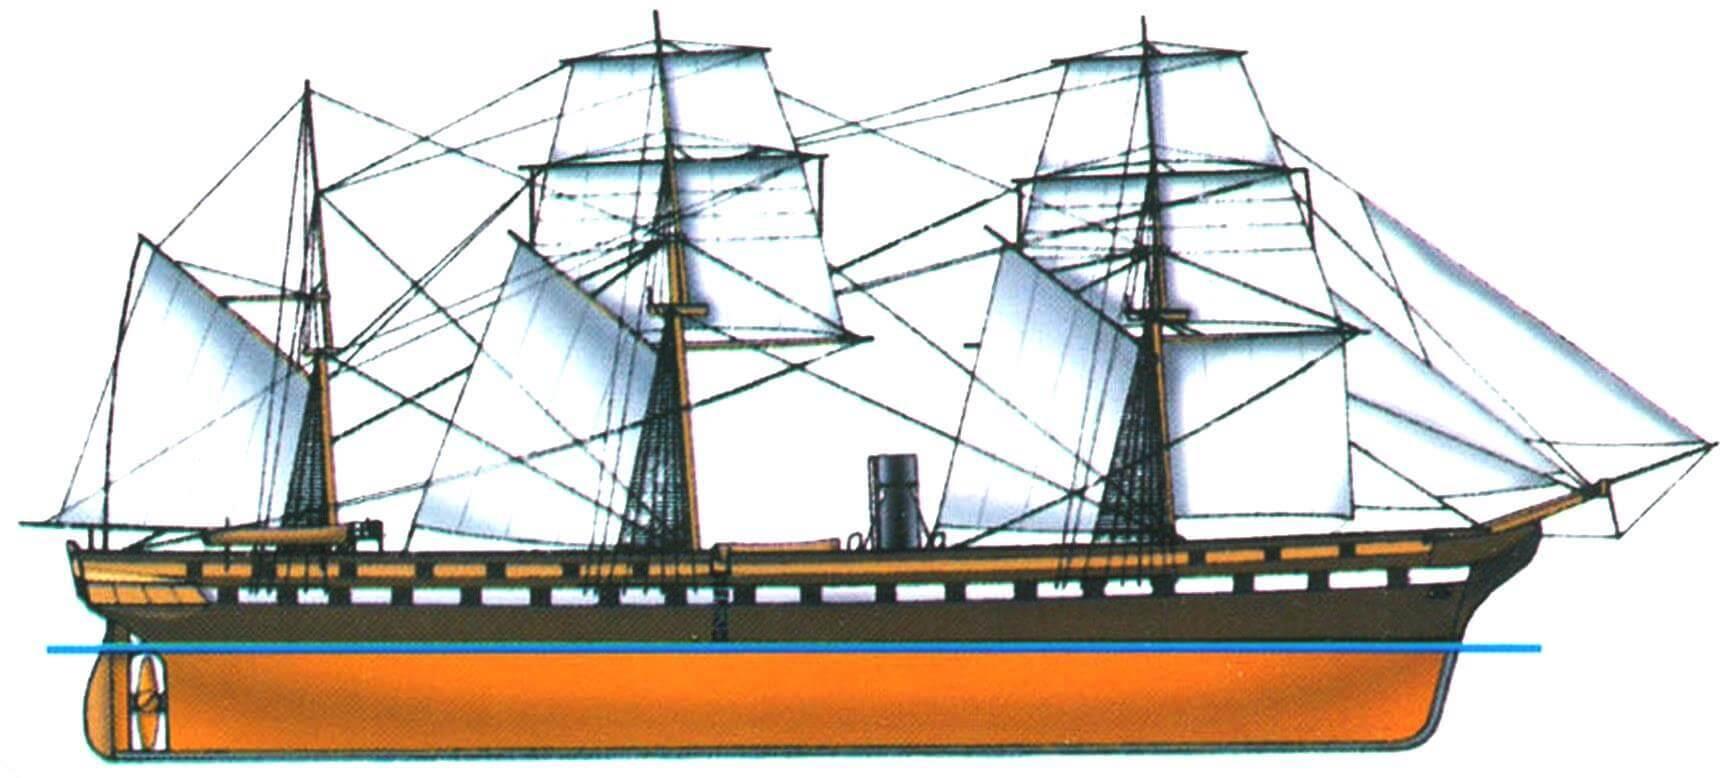 Винтовой фрегат «Шварценберг», Австро-Венгрия, 1862 г